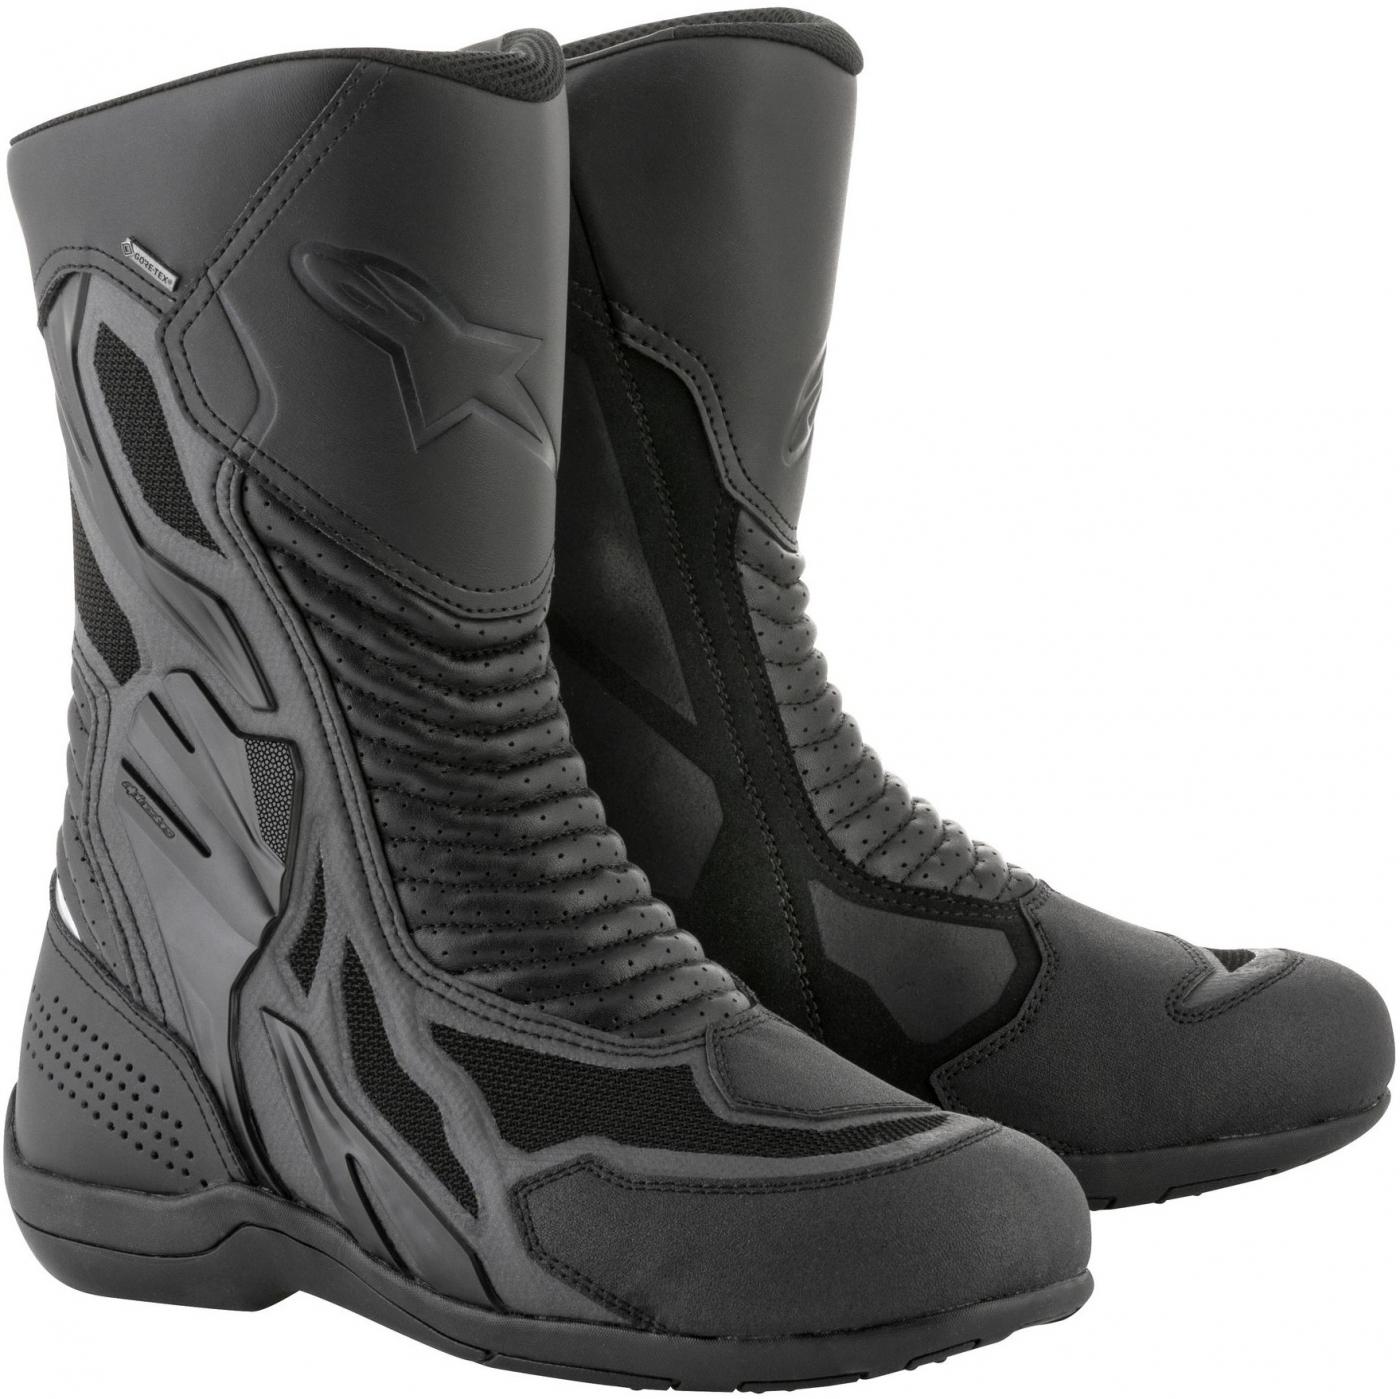 5c5c1d84f5b7 ALPINESTARS topánky AIR PLUS v2 GORE-TEX XCR black